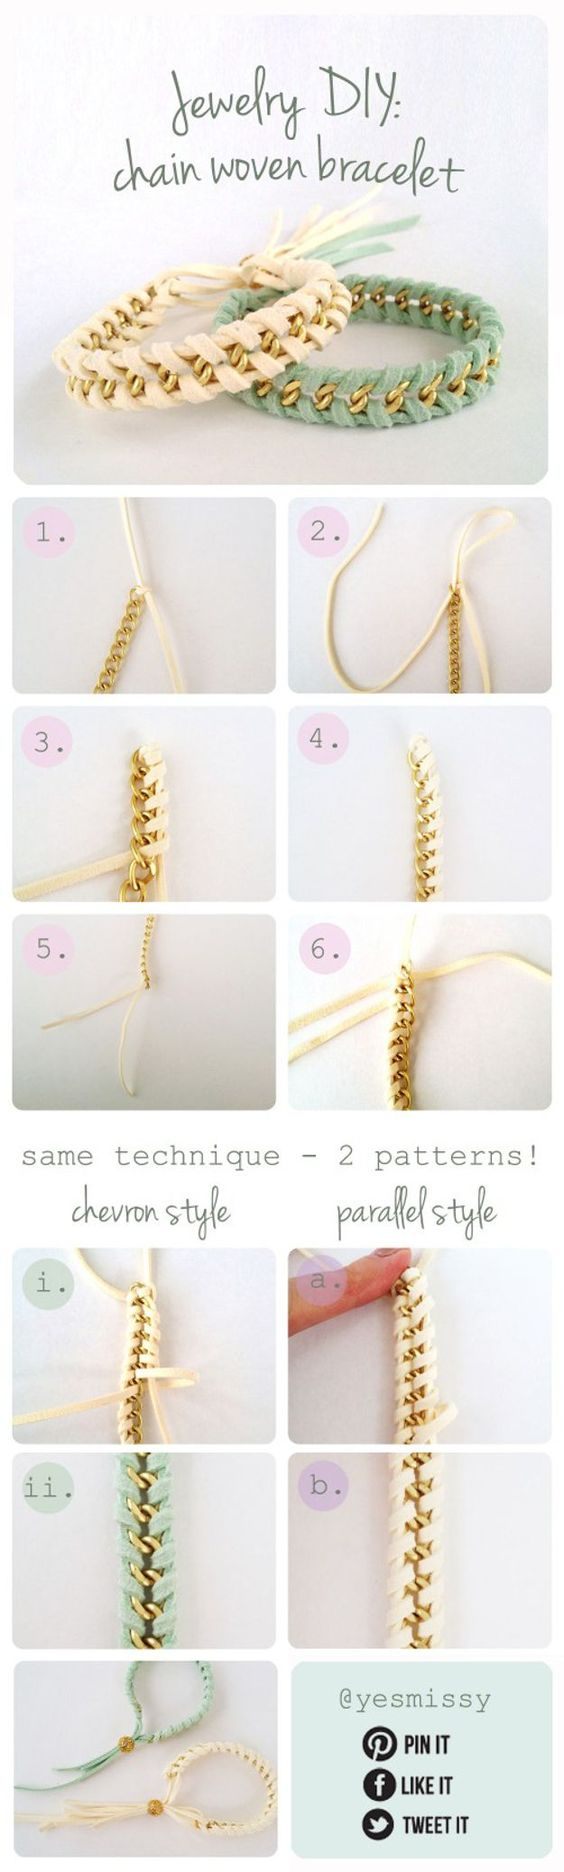 Jewelry Making! DIY Braided Bracelets | http://diyready.com/4-wire-jewelry-making-techniques-diy-bracelets/